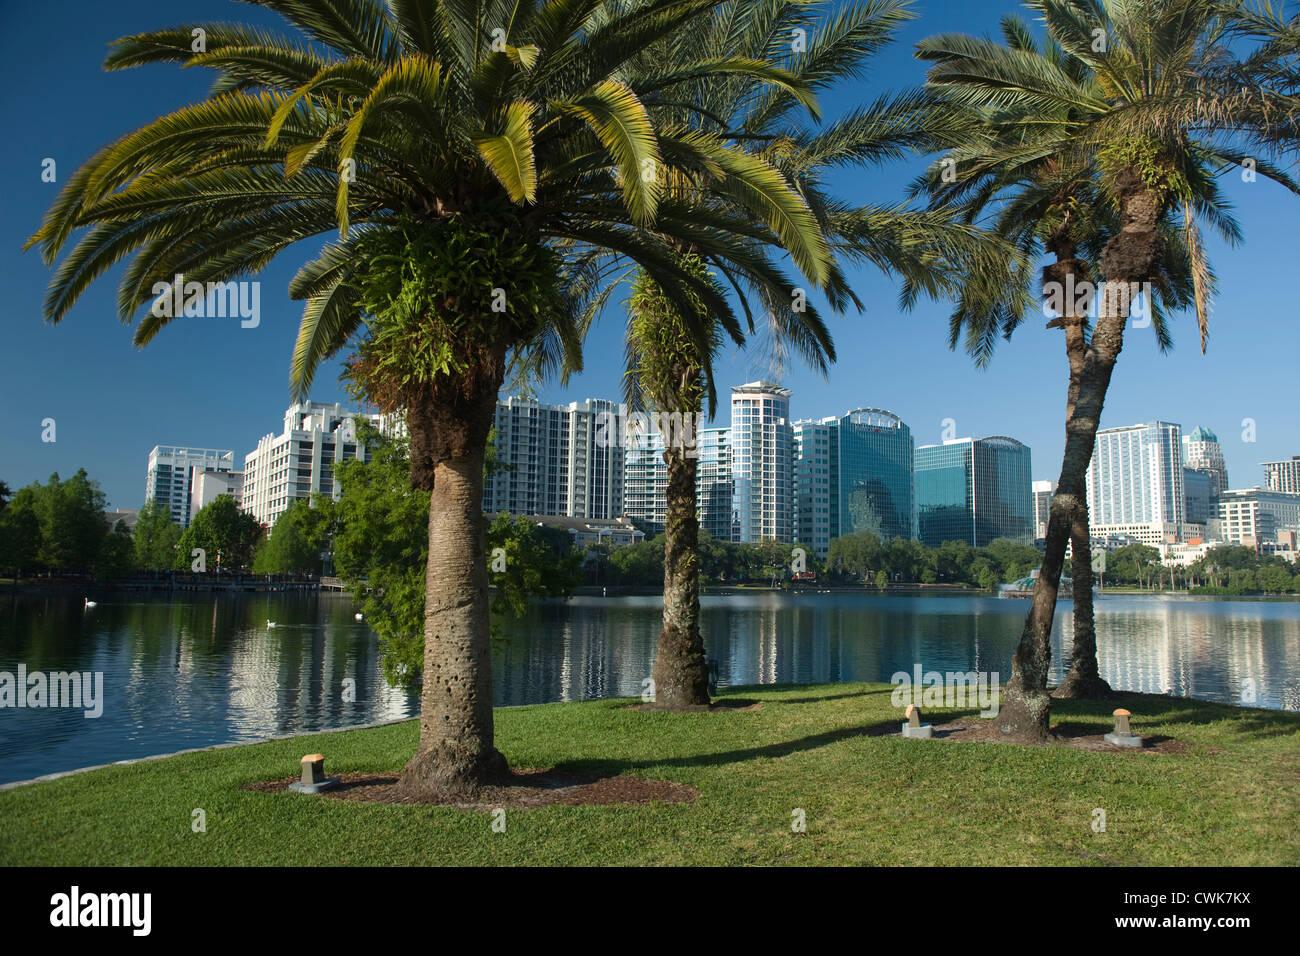 PALM TREES DOWNTOWN SKYLINE LAKE EOLA PARK ORLANDO FLORIDA USA - Stock Image